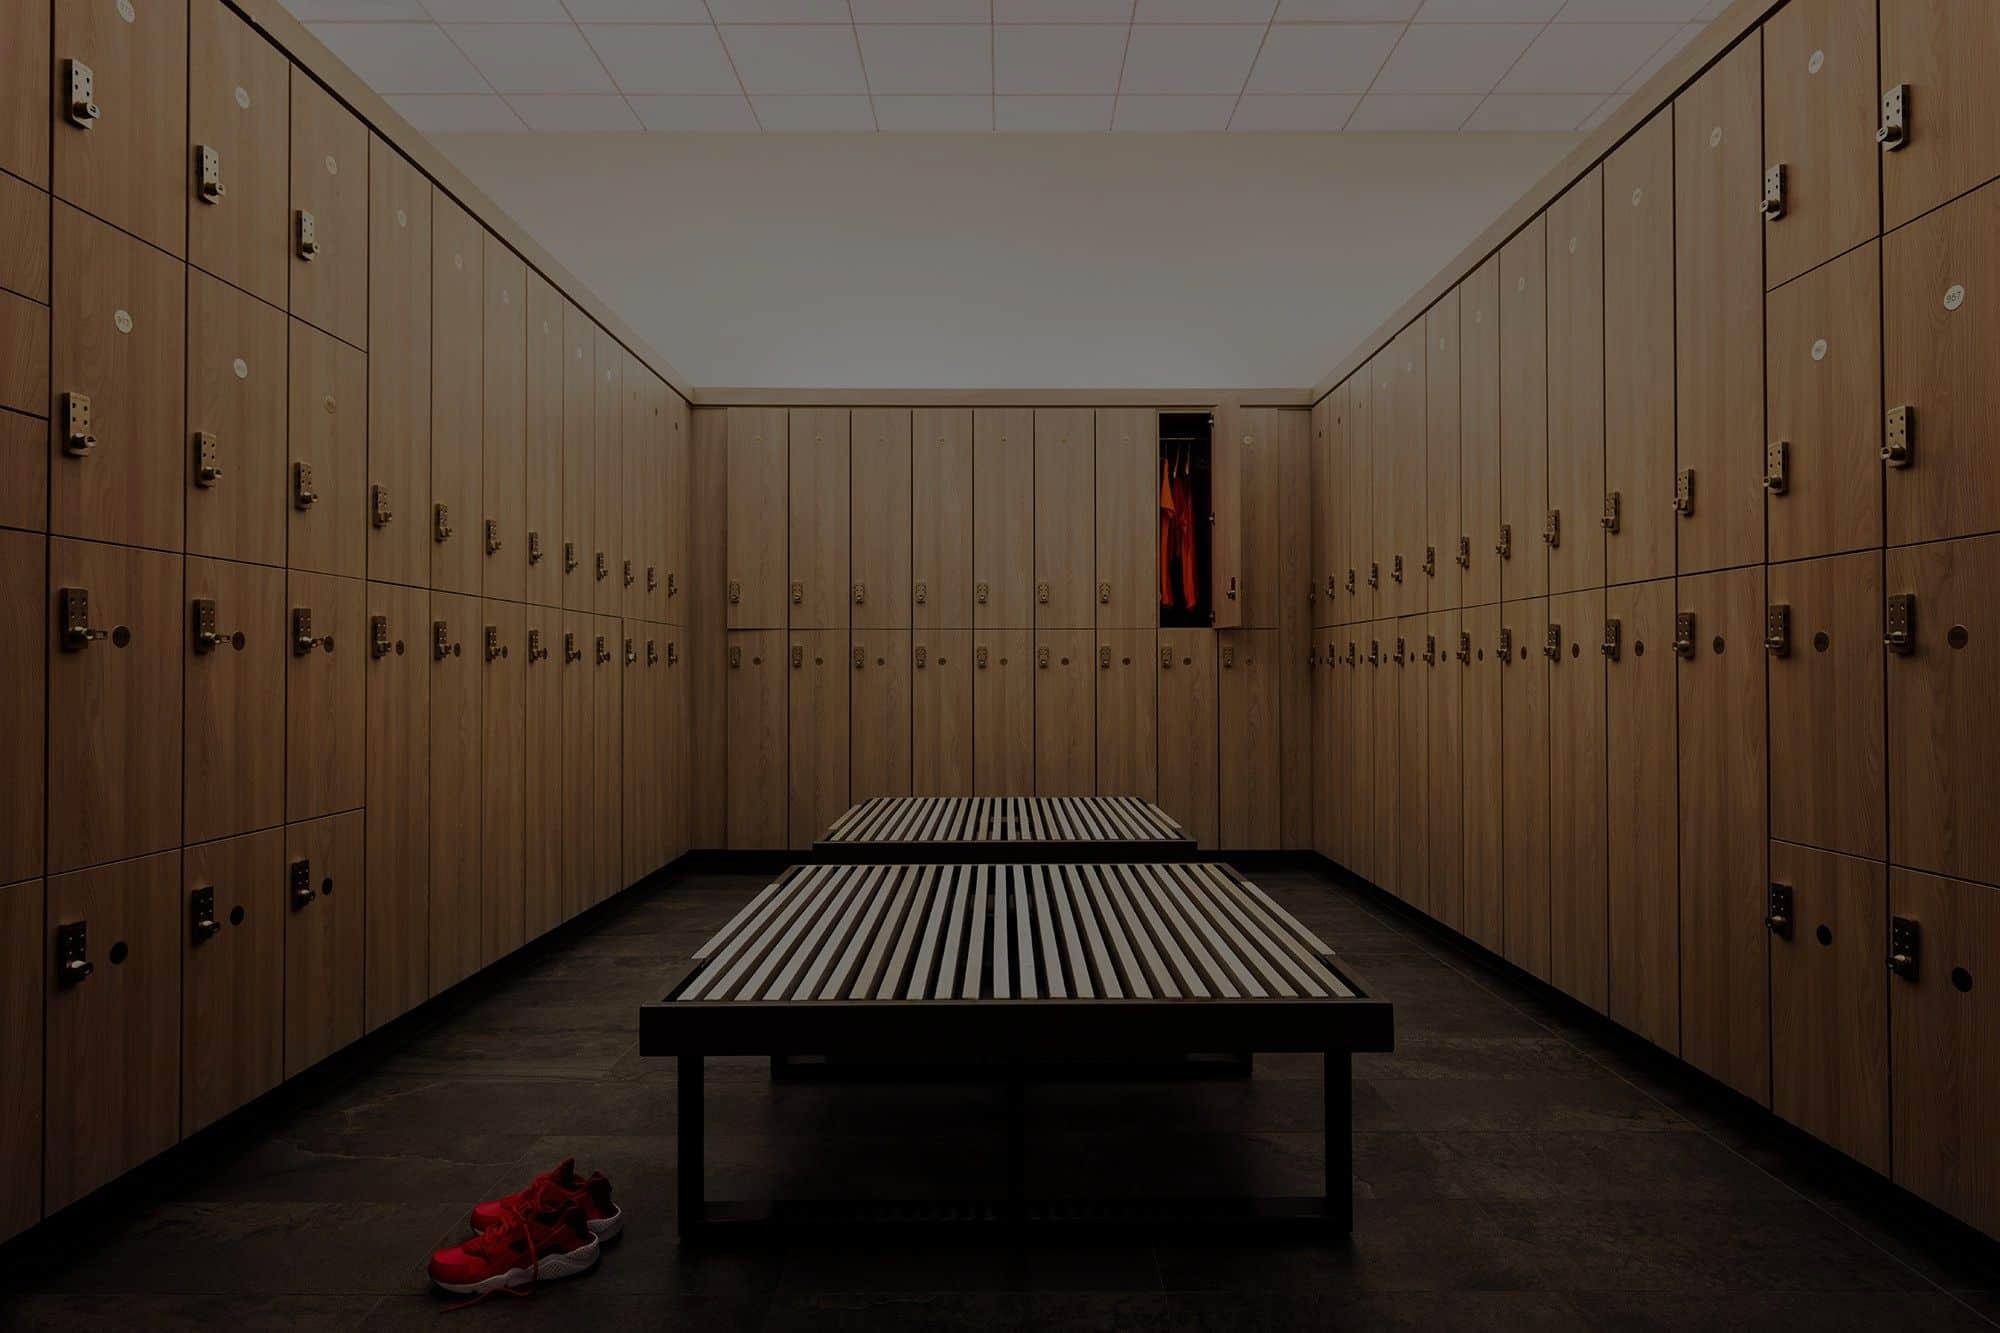 Sports Locker Room Example 2